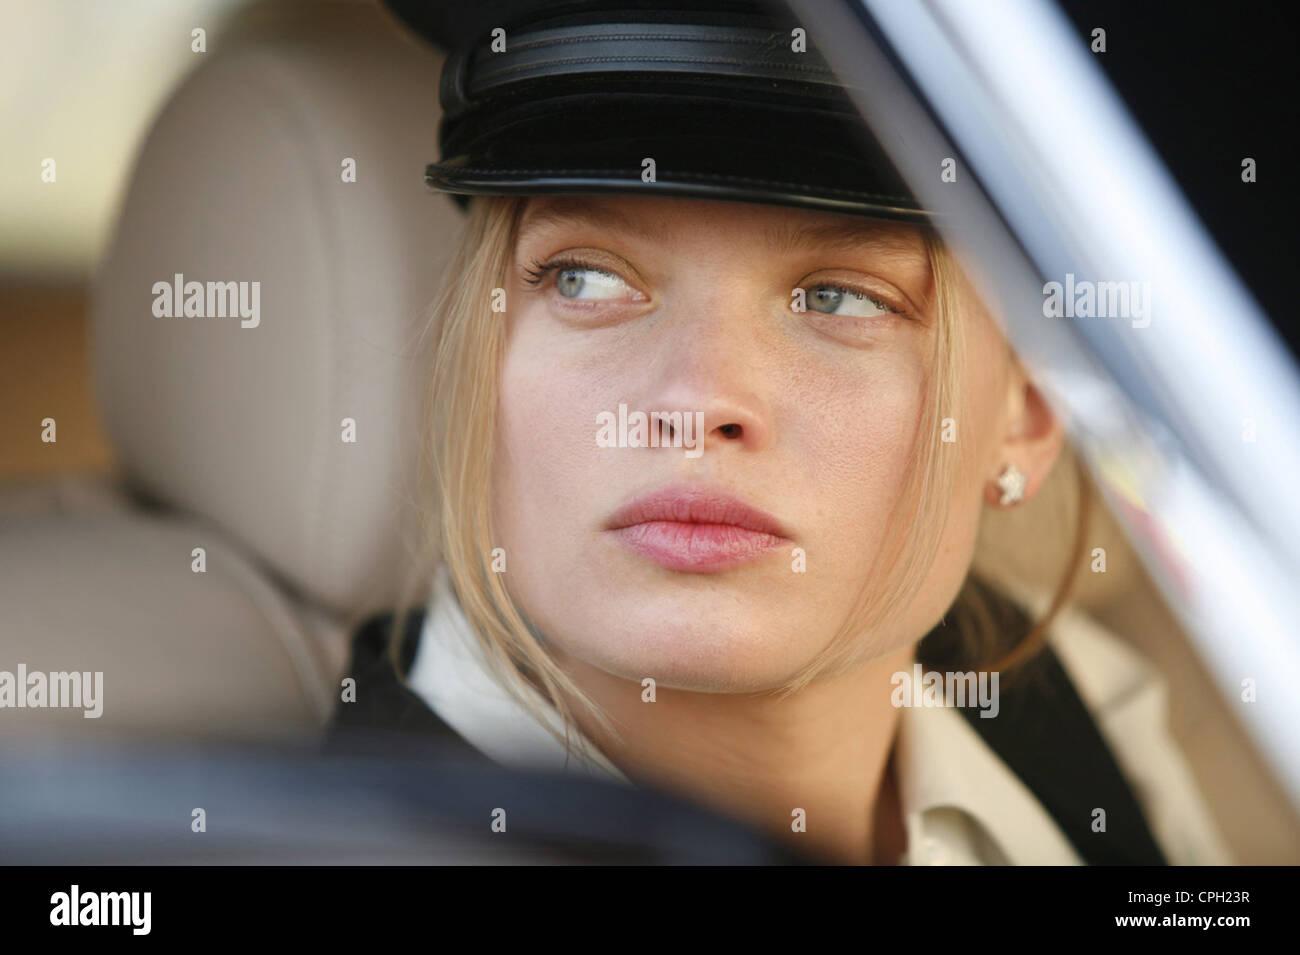 LARGO WINCH (2008) MELANIE THIERRY JEROME SALLE (DIR) 004 MOVIESTORE COLLECTION LTD - Stock Image